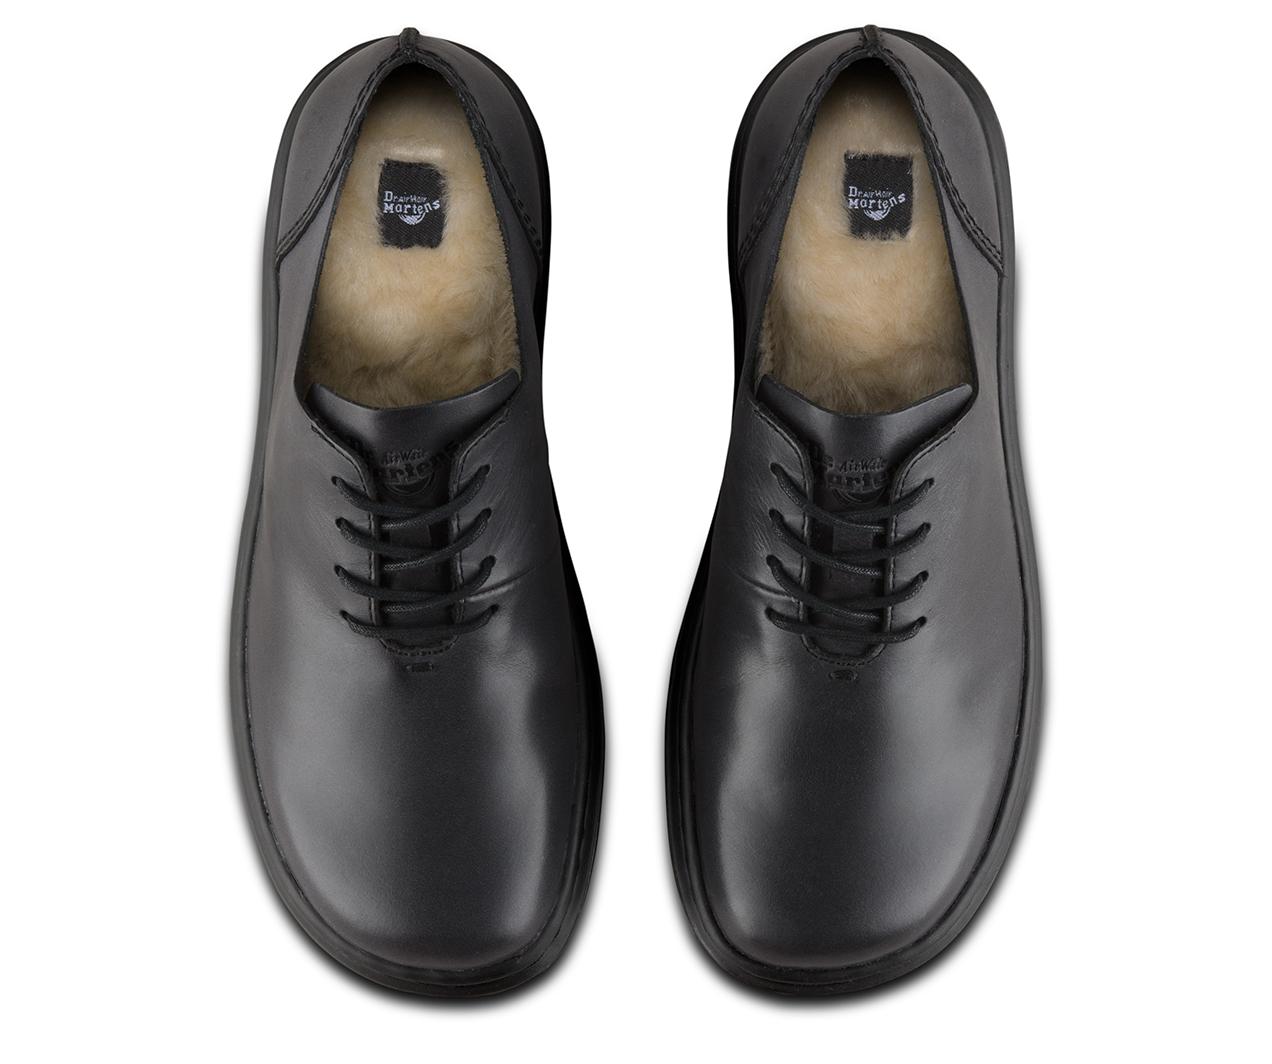 Lorrie III Lace Shoe X2 Insoles Dr. Martens l6FrUOb